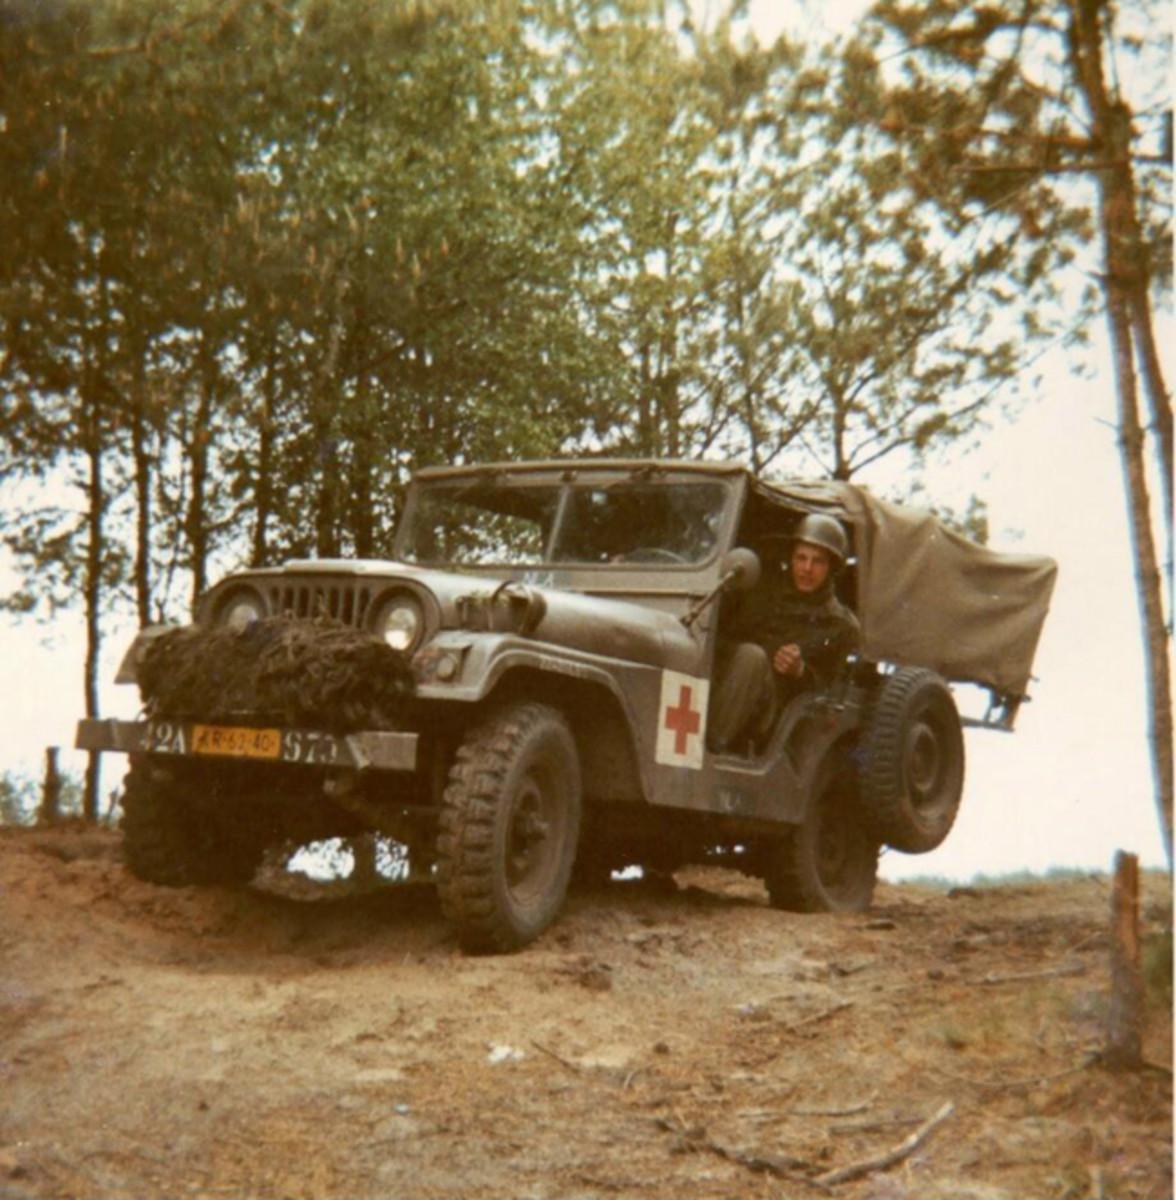 M38A1 NEKAF (Nederlandse Kaiser-Frazer Fabrieken Rotterdam) Ambulance of the Royal Dutch Army, 1974.